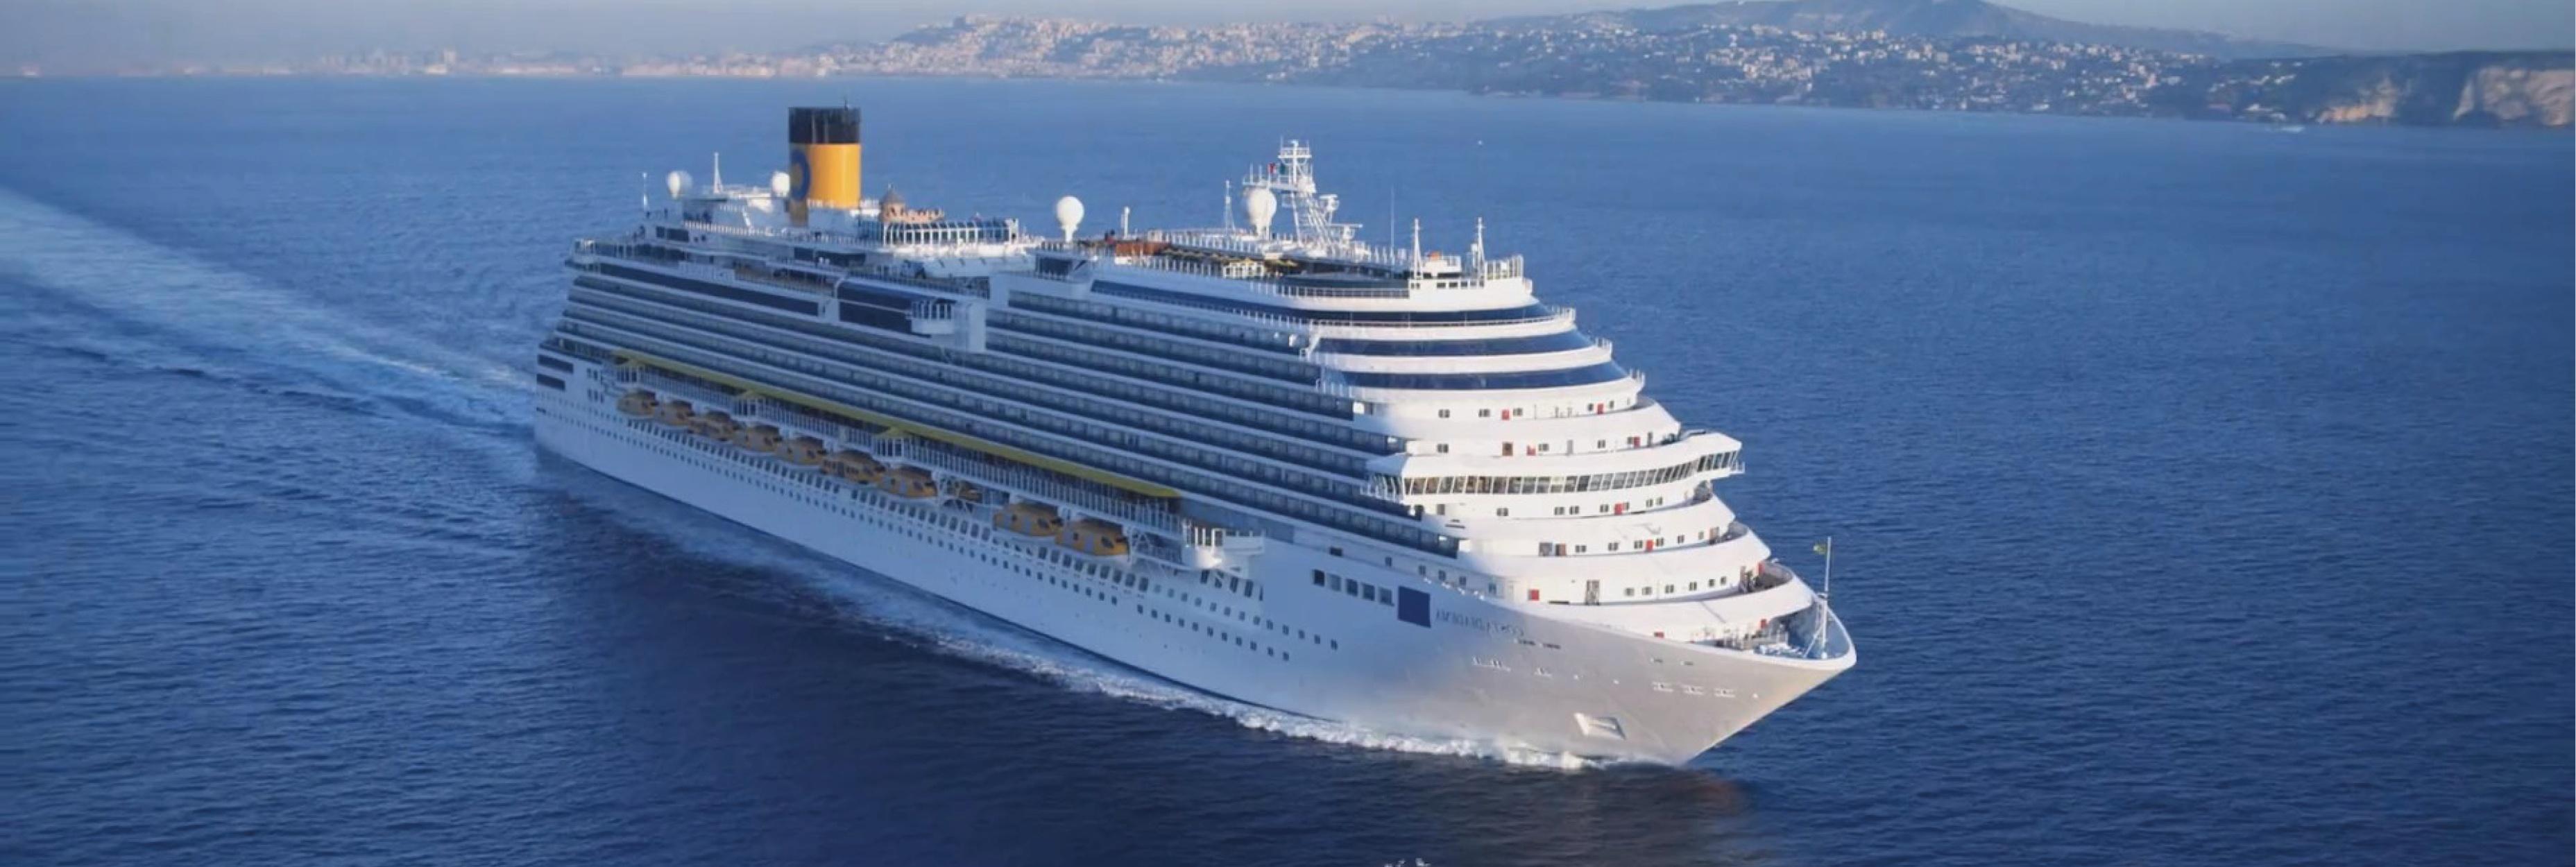 Winnow and Costa Cruises team up to halve food waste